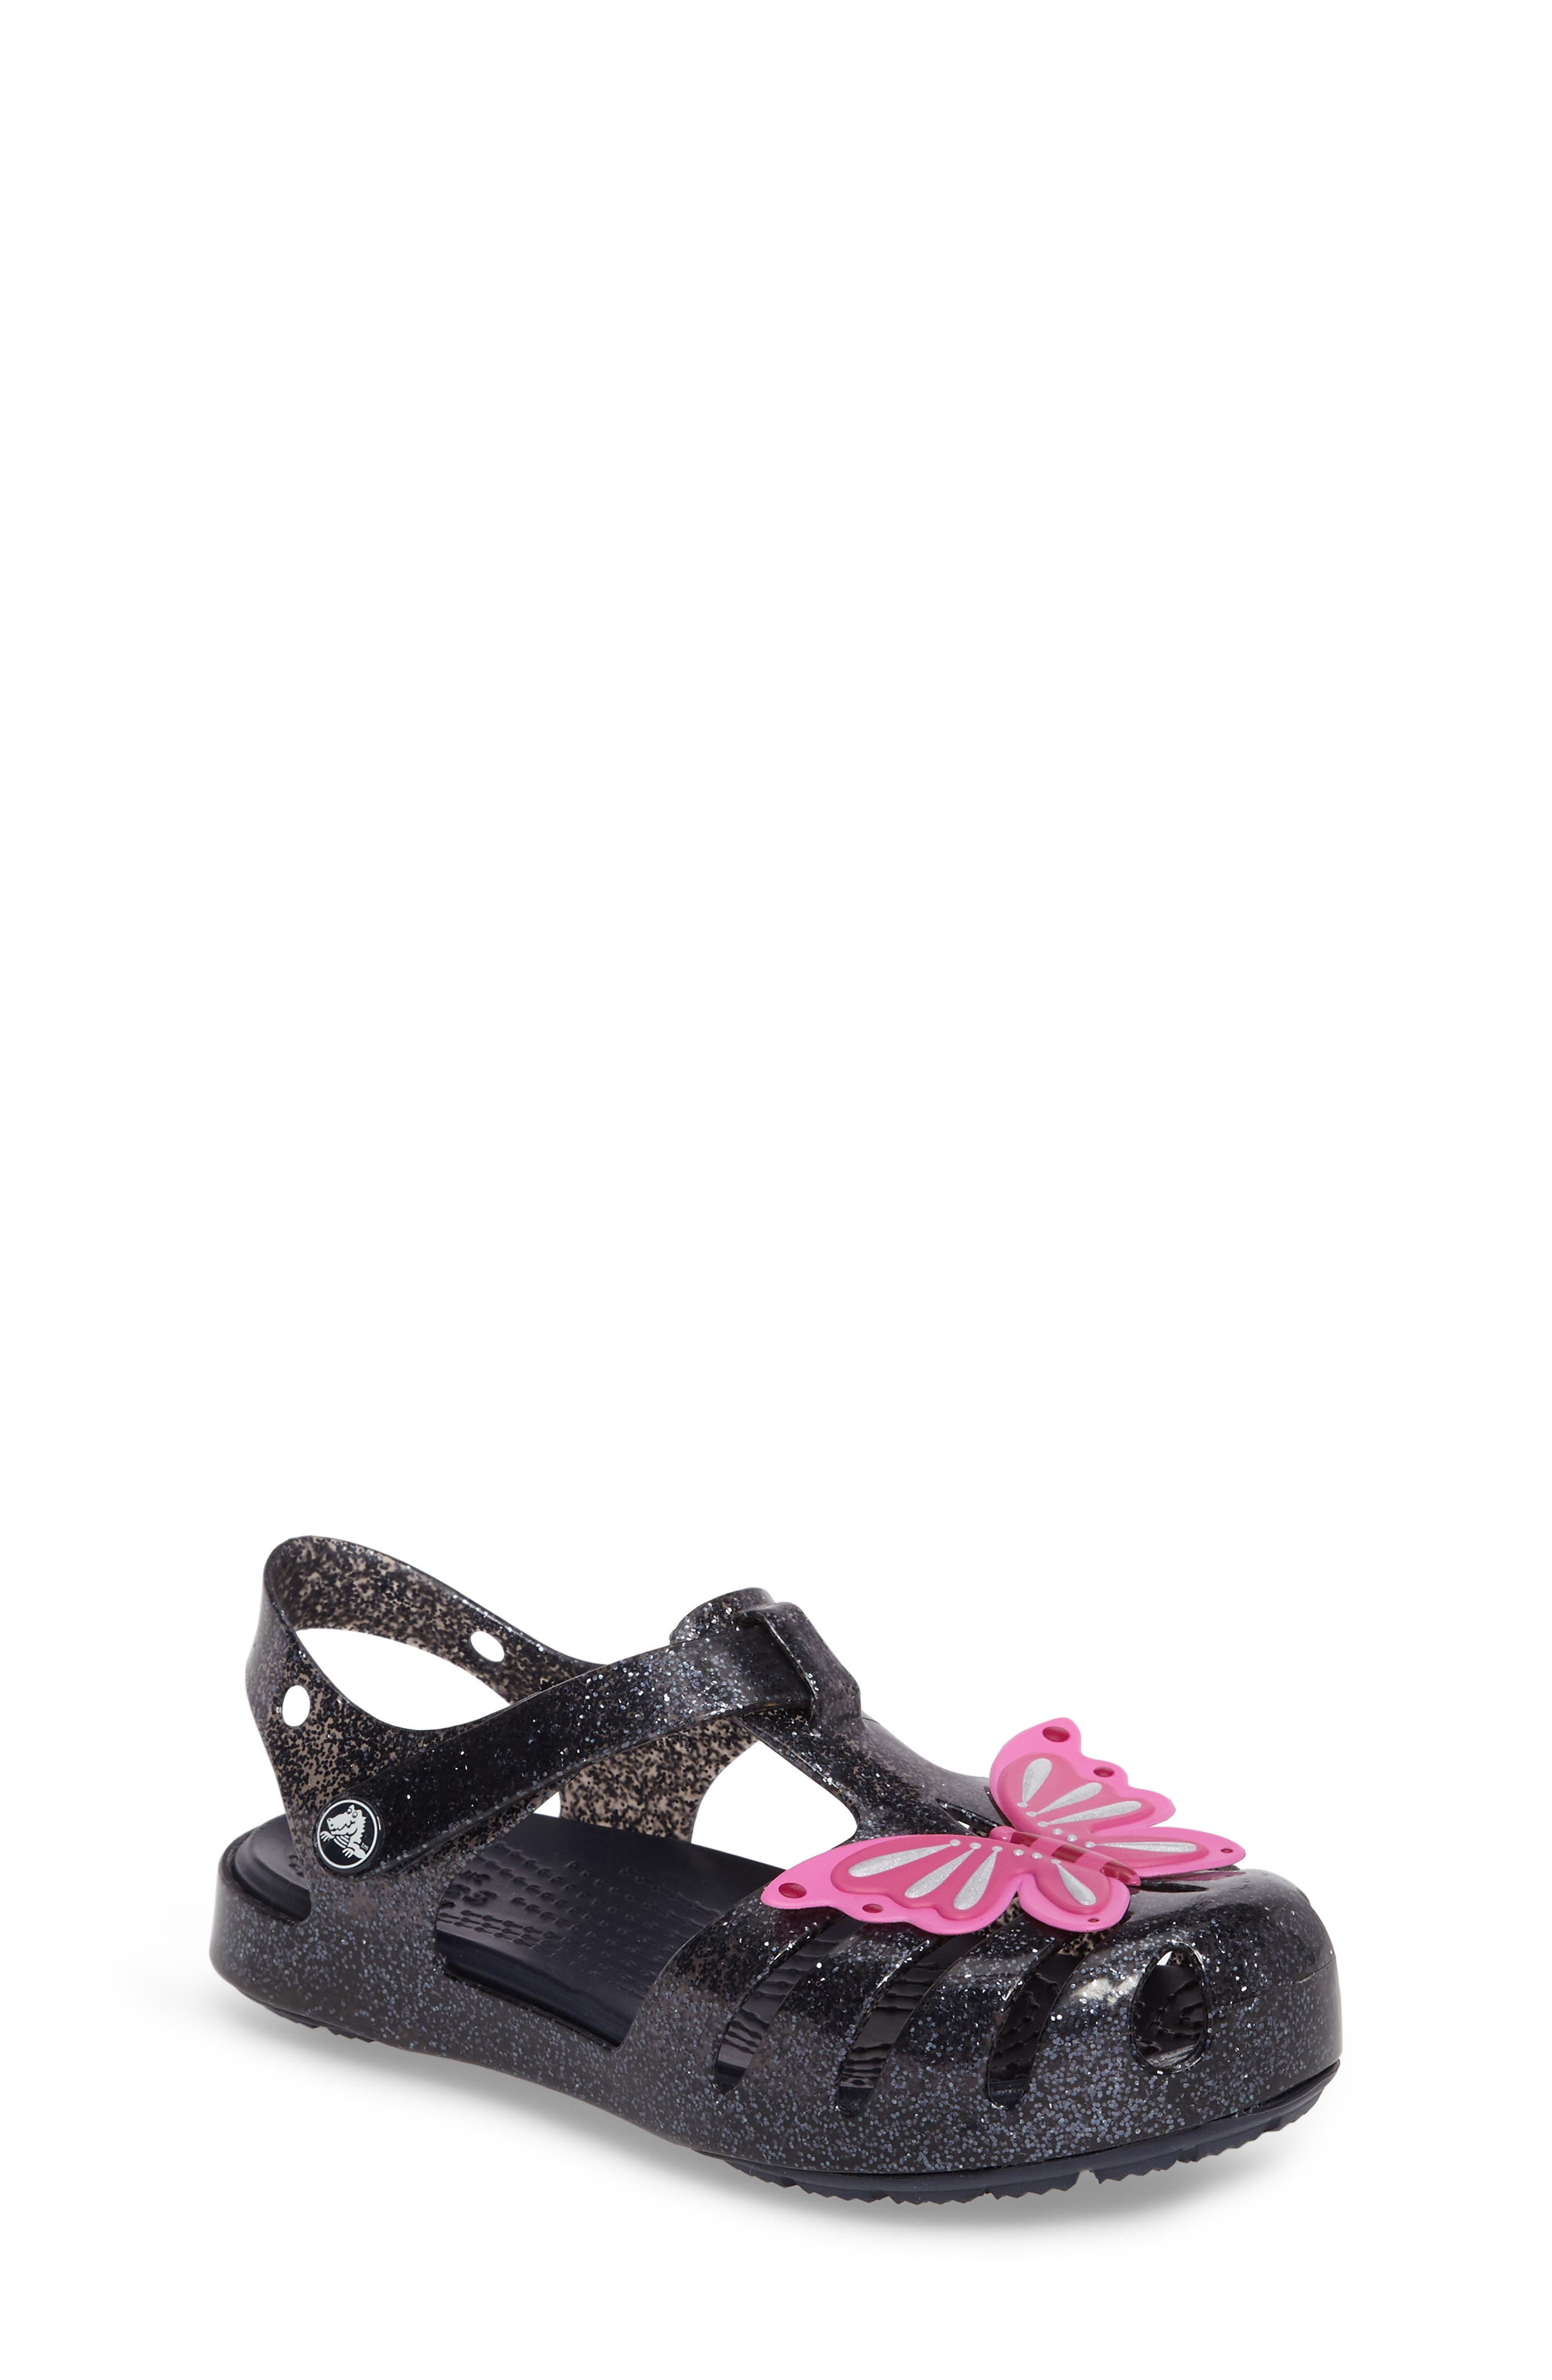 CROCS™ Isabella Novelty Sandal